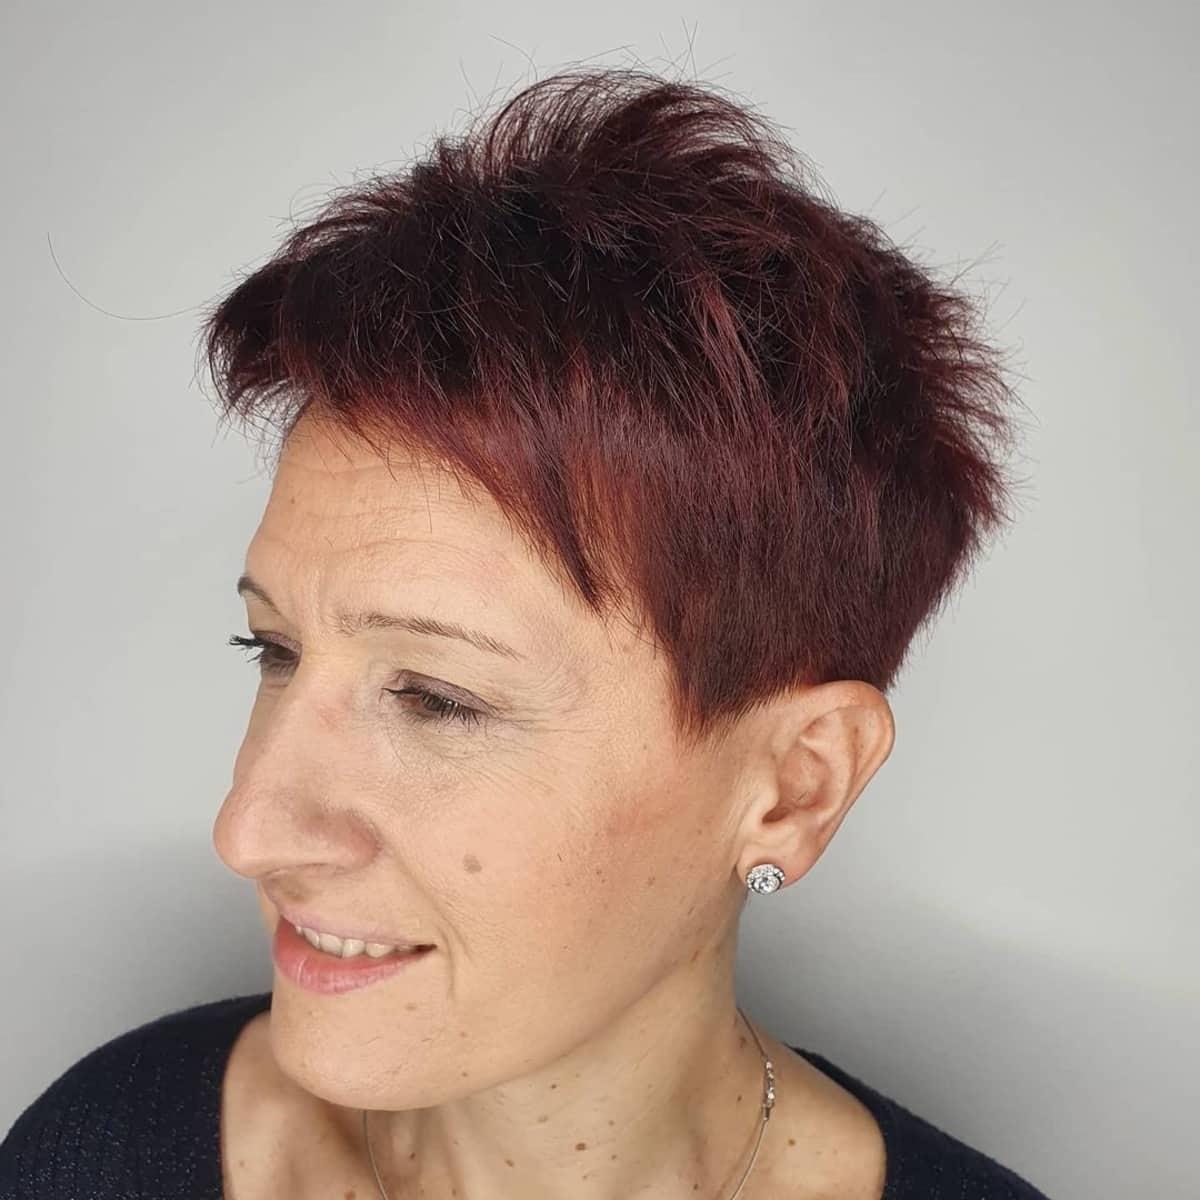 Corte de pelo corto entrecortado Pixie para personas mayores con cabello fino